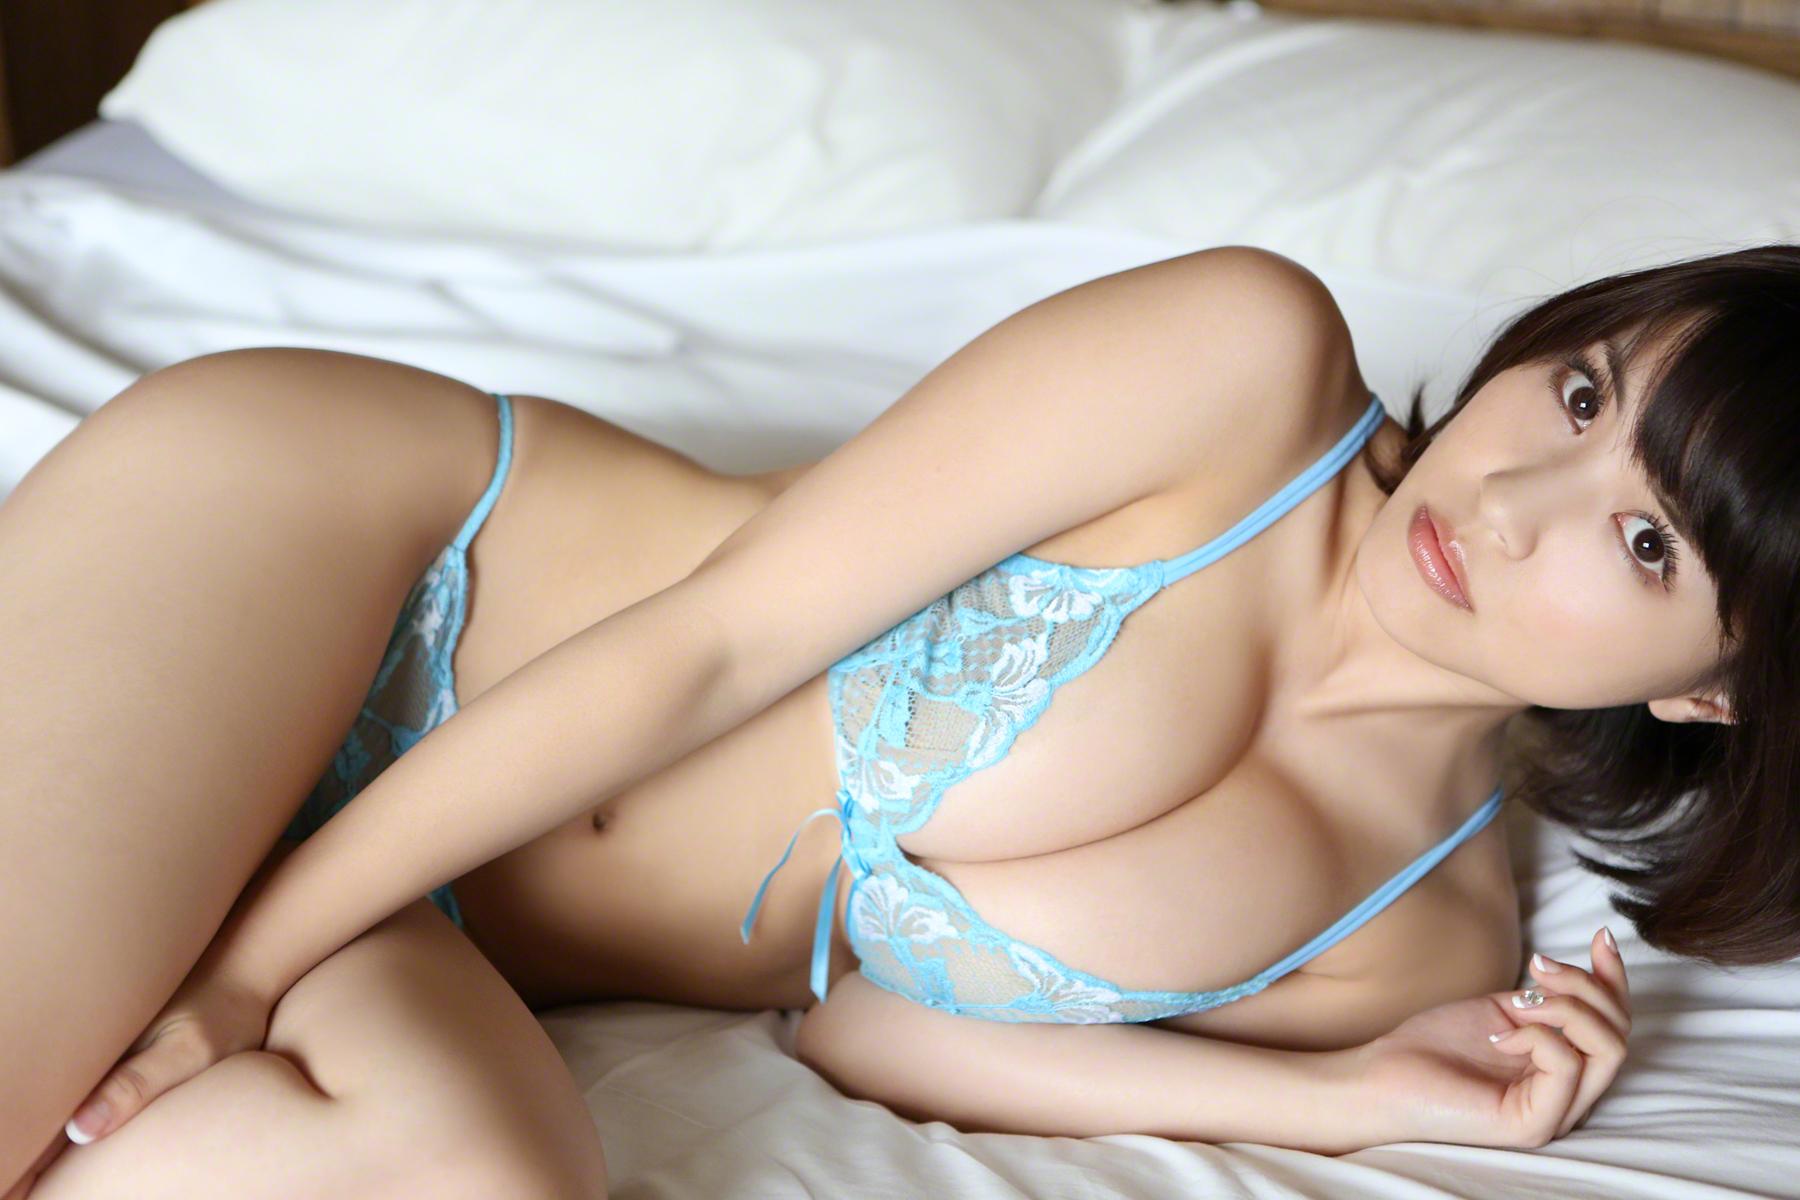 Asuka Kishi Wanibooks Hot Model Pictures Gallery @ Gravure ...